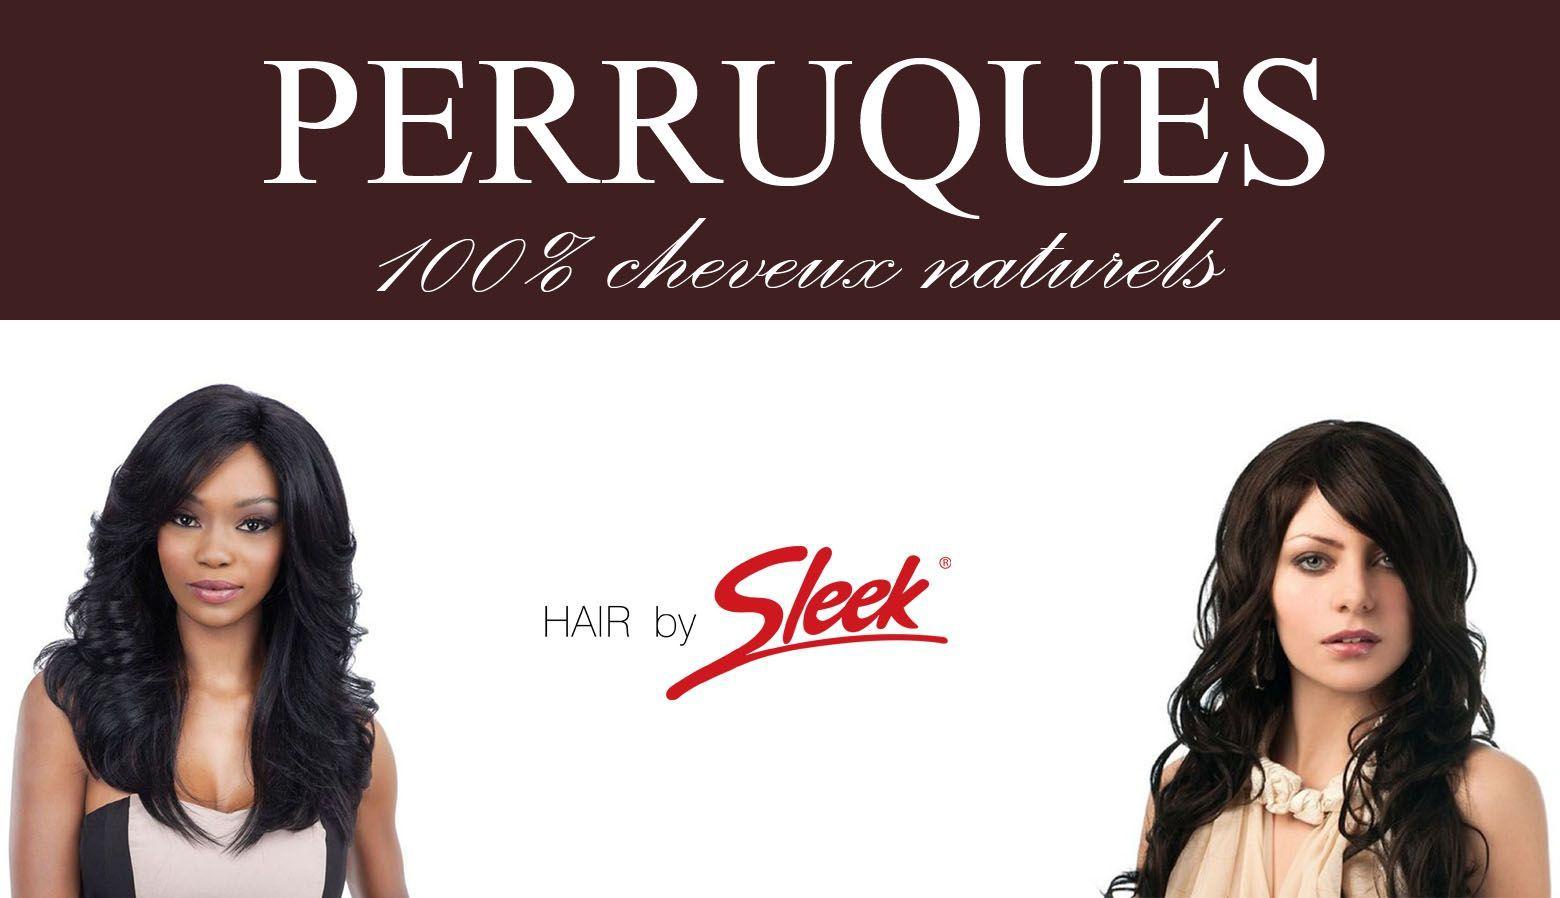 Perruques Sleek Hair 100% Cheuveux Naturels